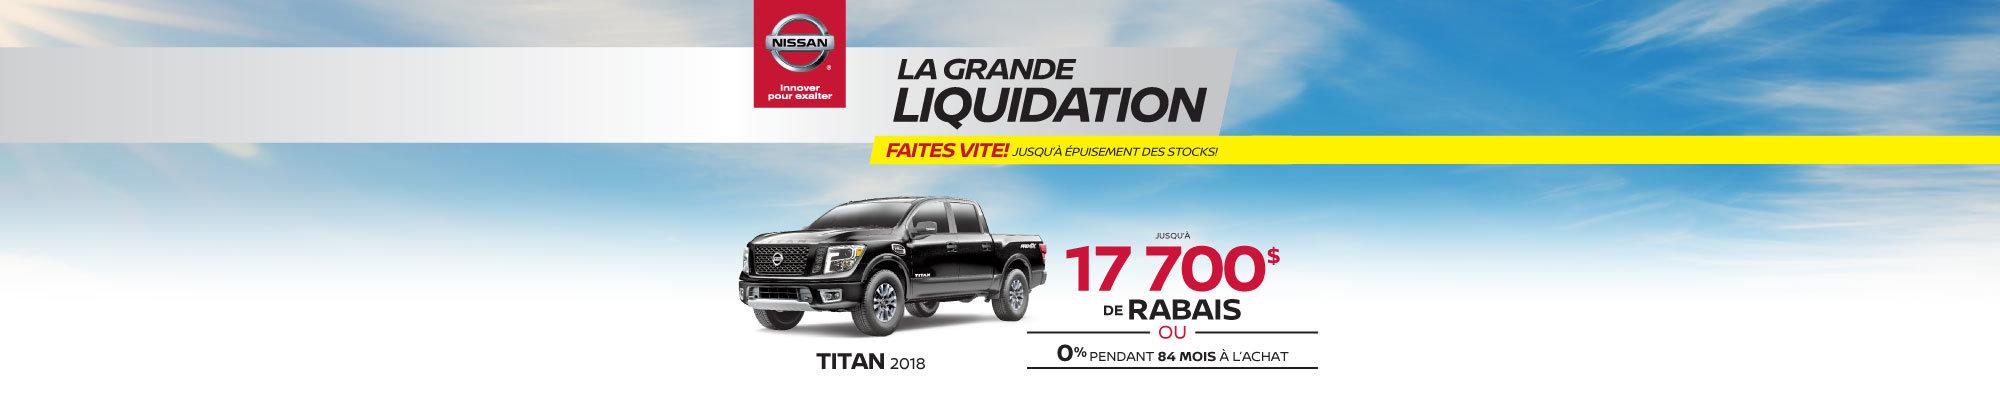 TITAN 2018 web